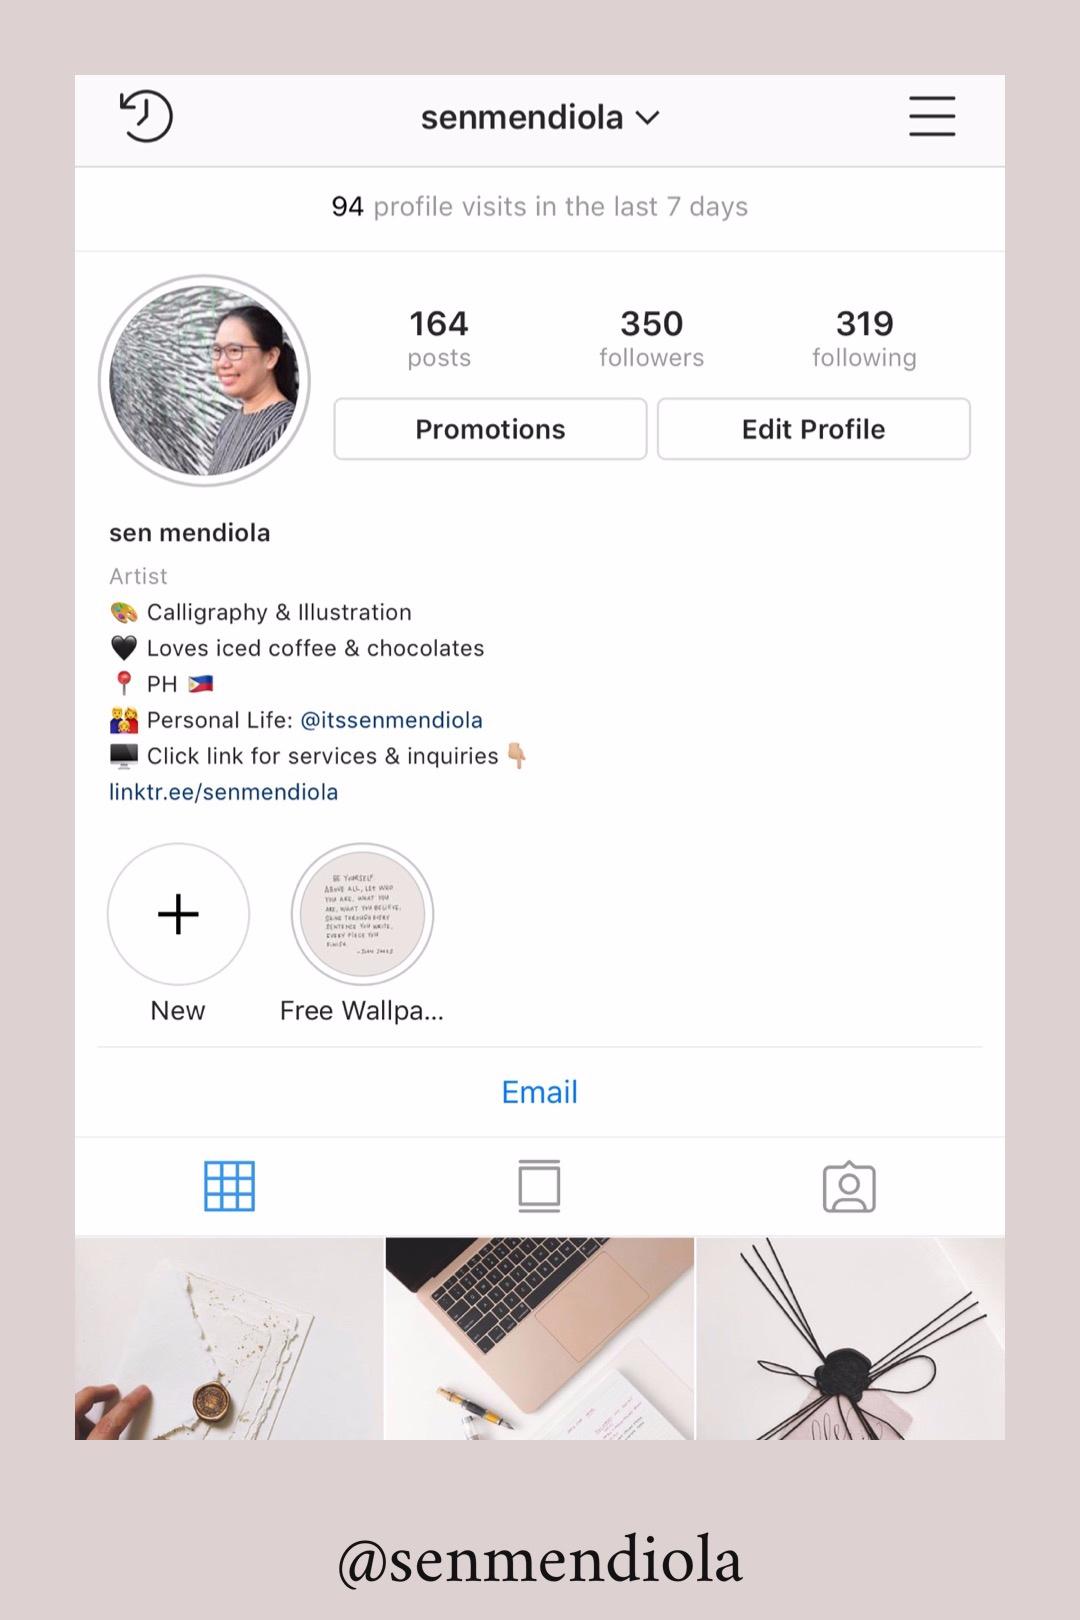 sen-mendiola-instagram-profile